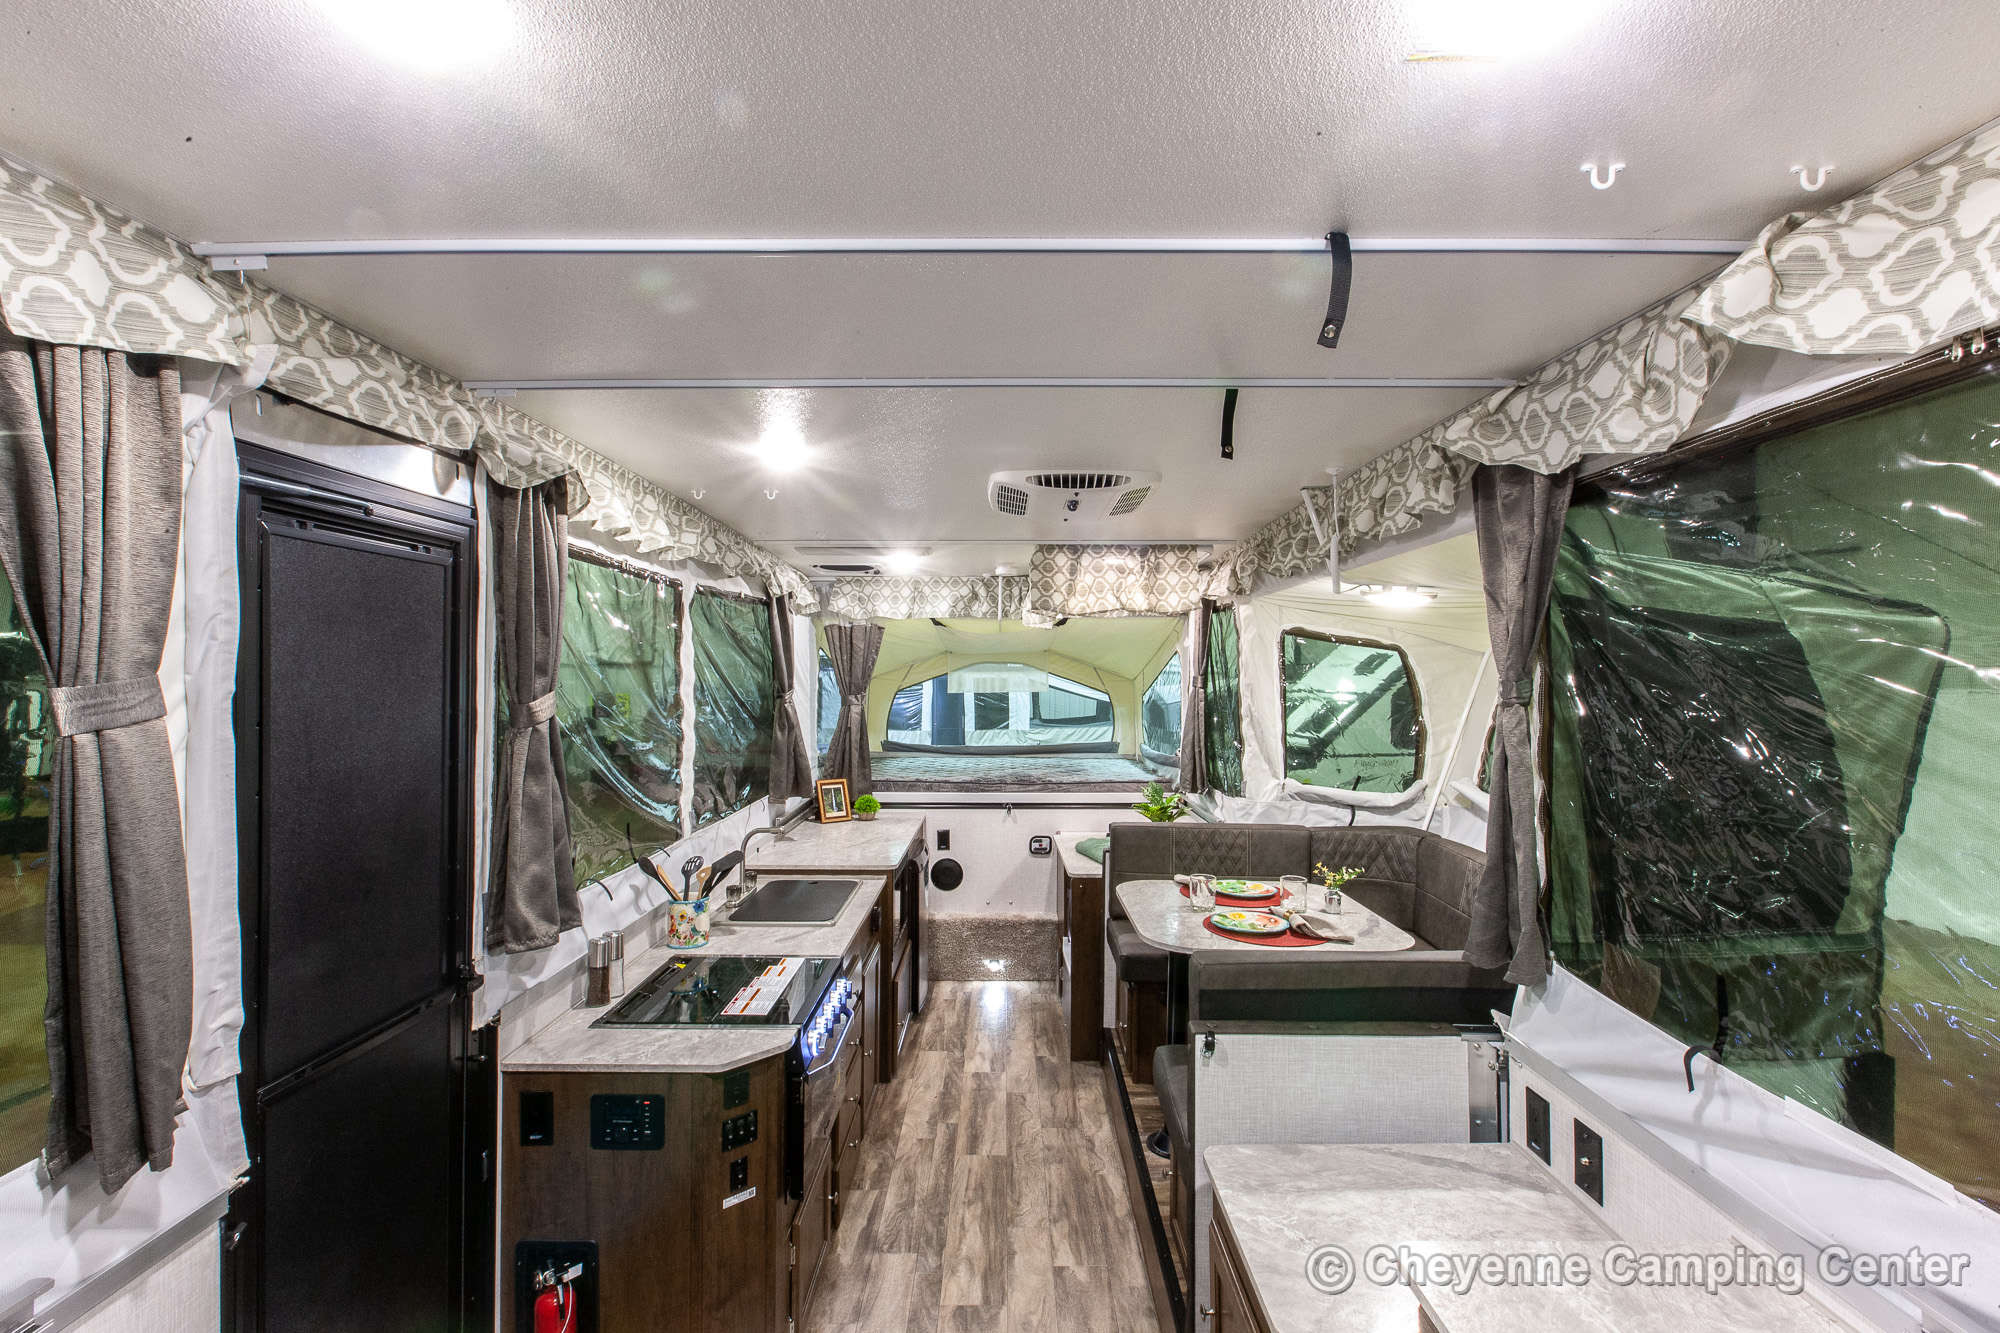 2021 Forest River Flagstaff High Wall HW29SC Folding Camper Interior Image